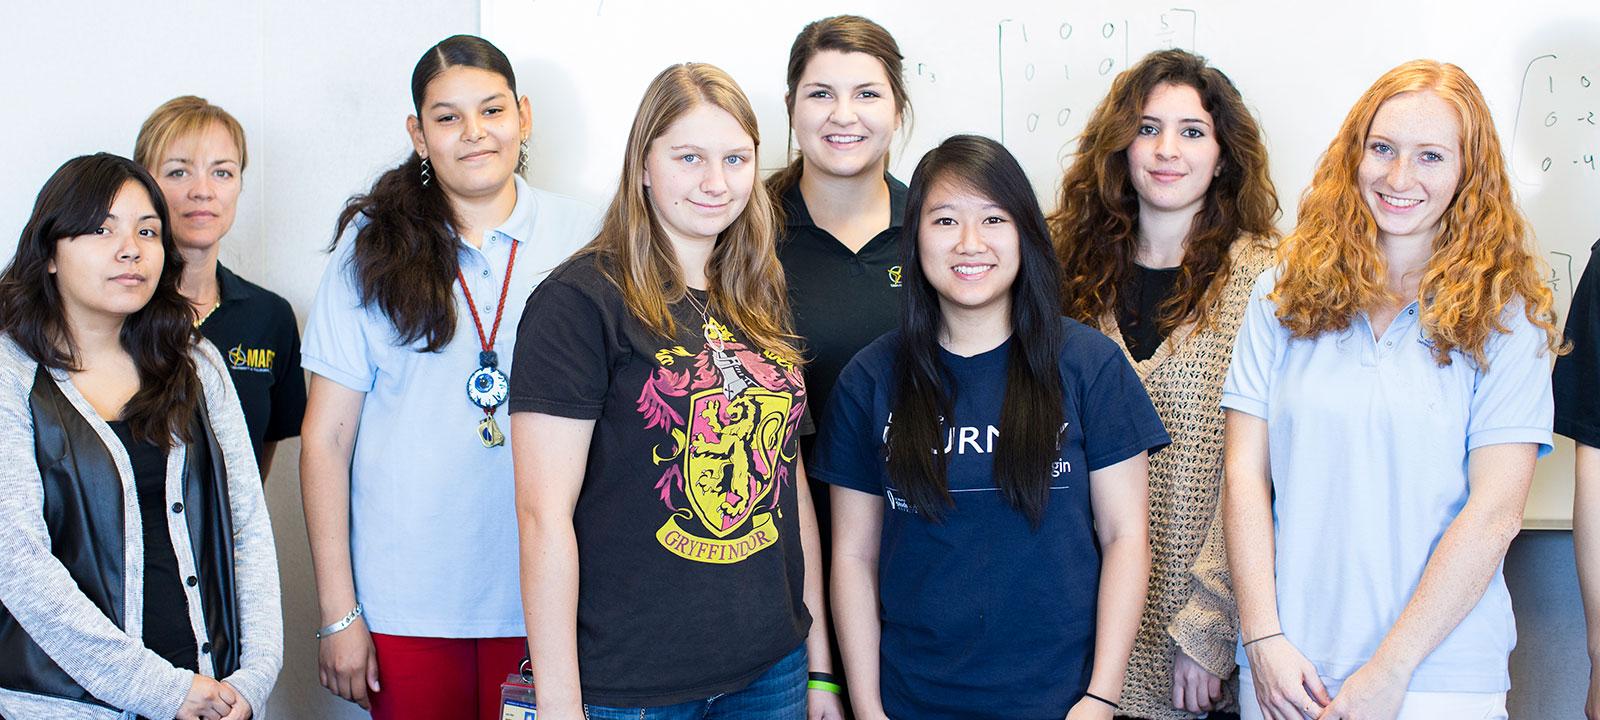 Female STEM students standing together